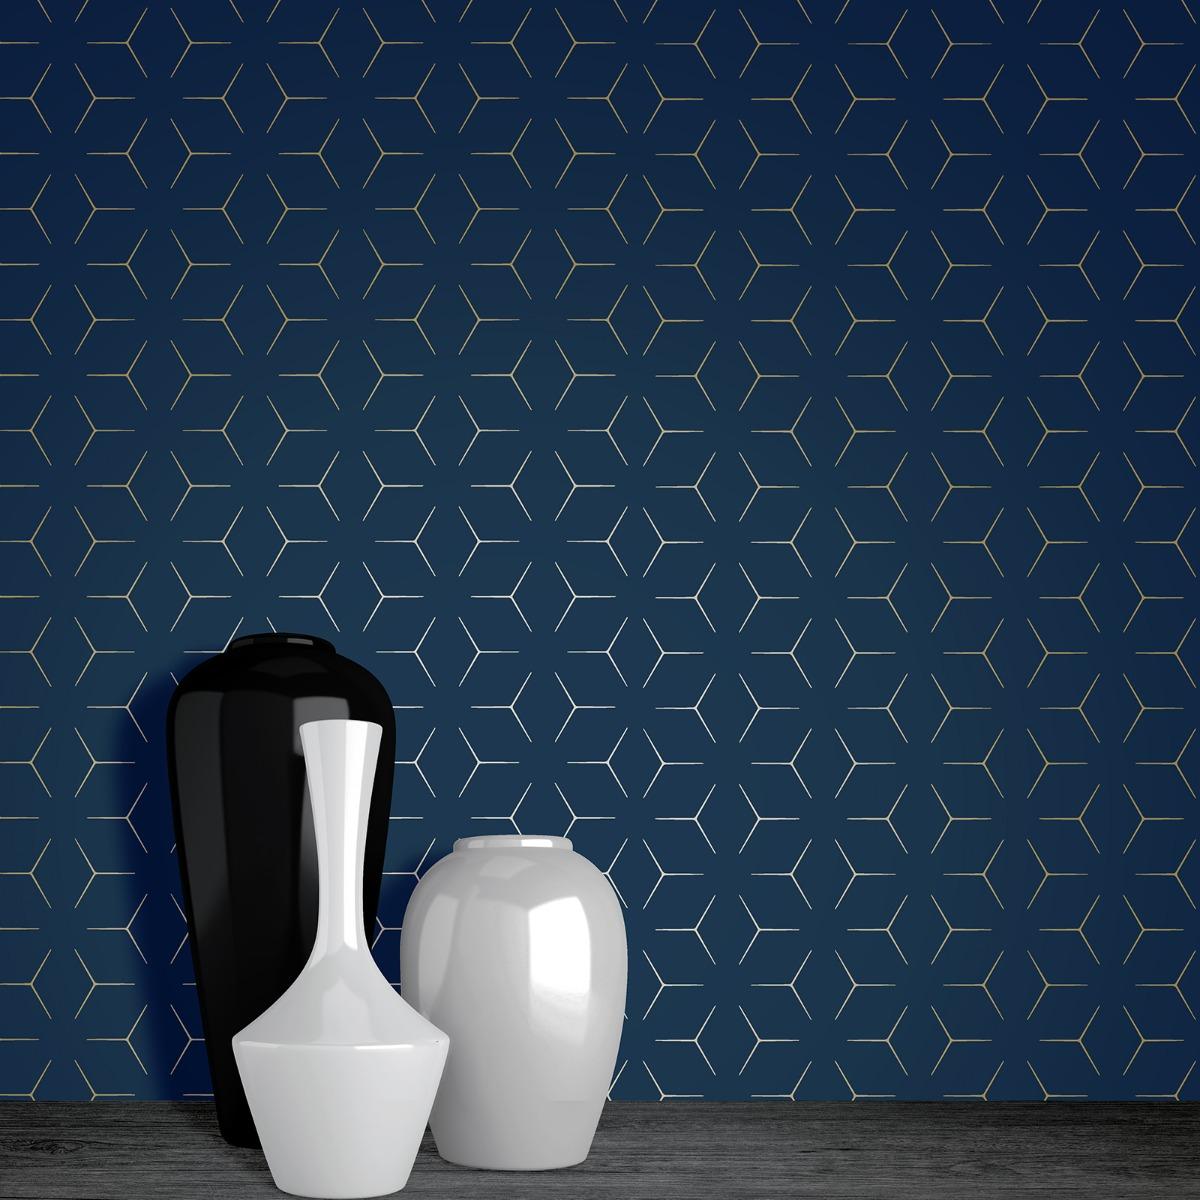 Metro Illusion Geometric Wallpaper - Navy Blue and Gold